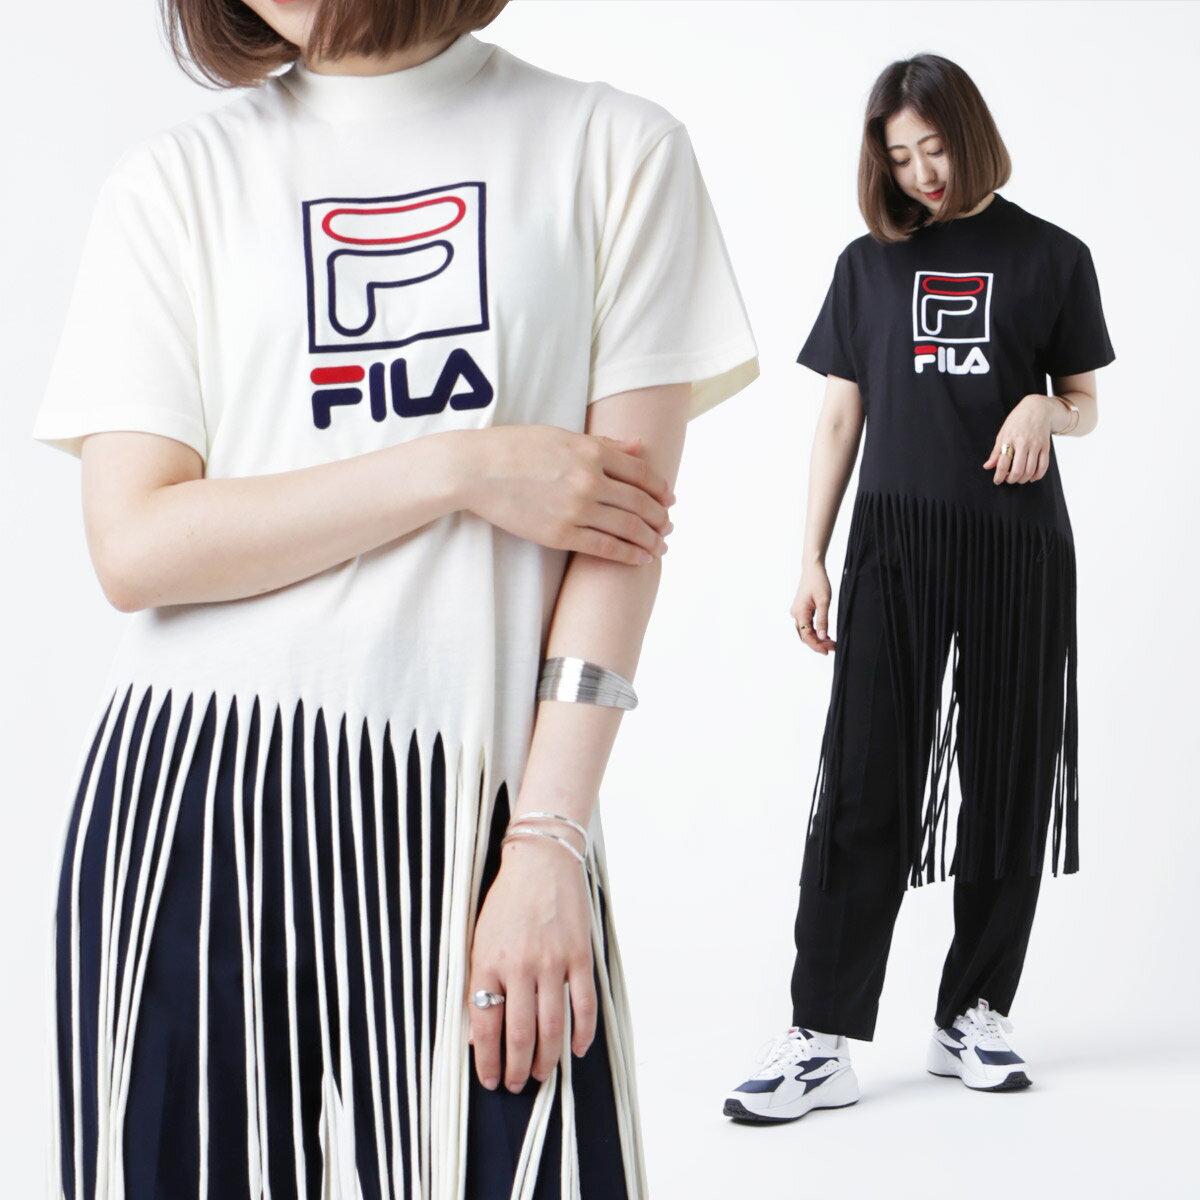 FILA x atmos pink FRINGE LONG T-shirt (フィラ x アトモスピンク フリンジ ロング Tシャツ)18AW-S